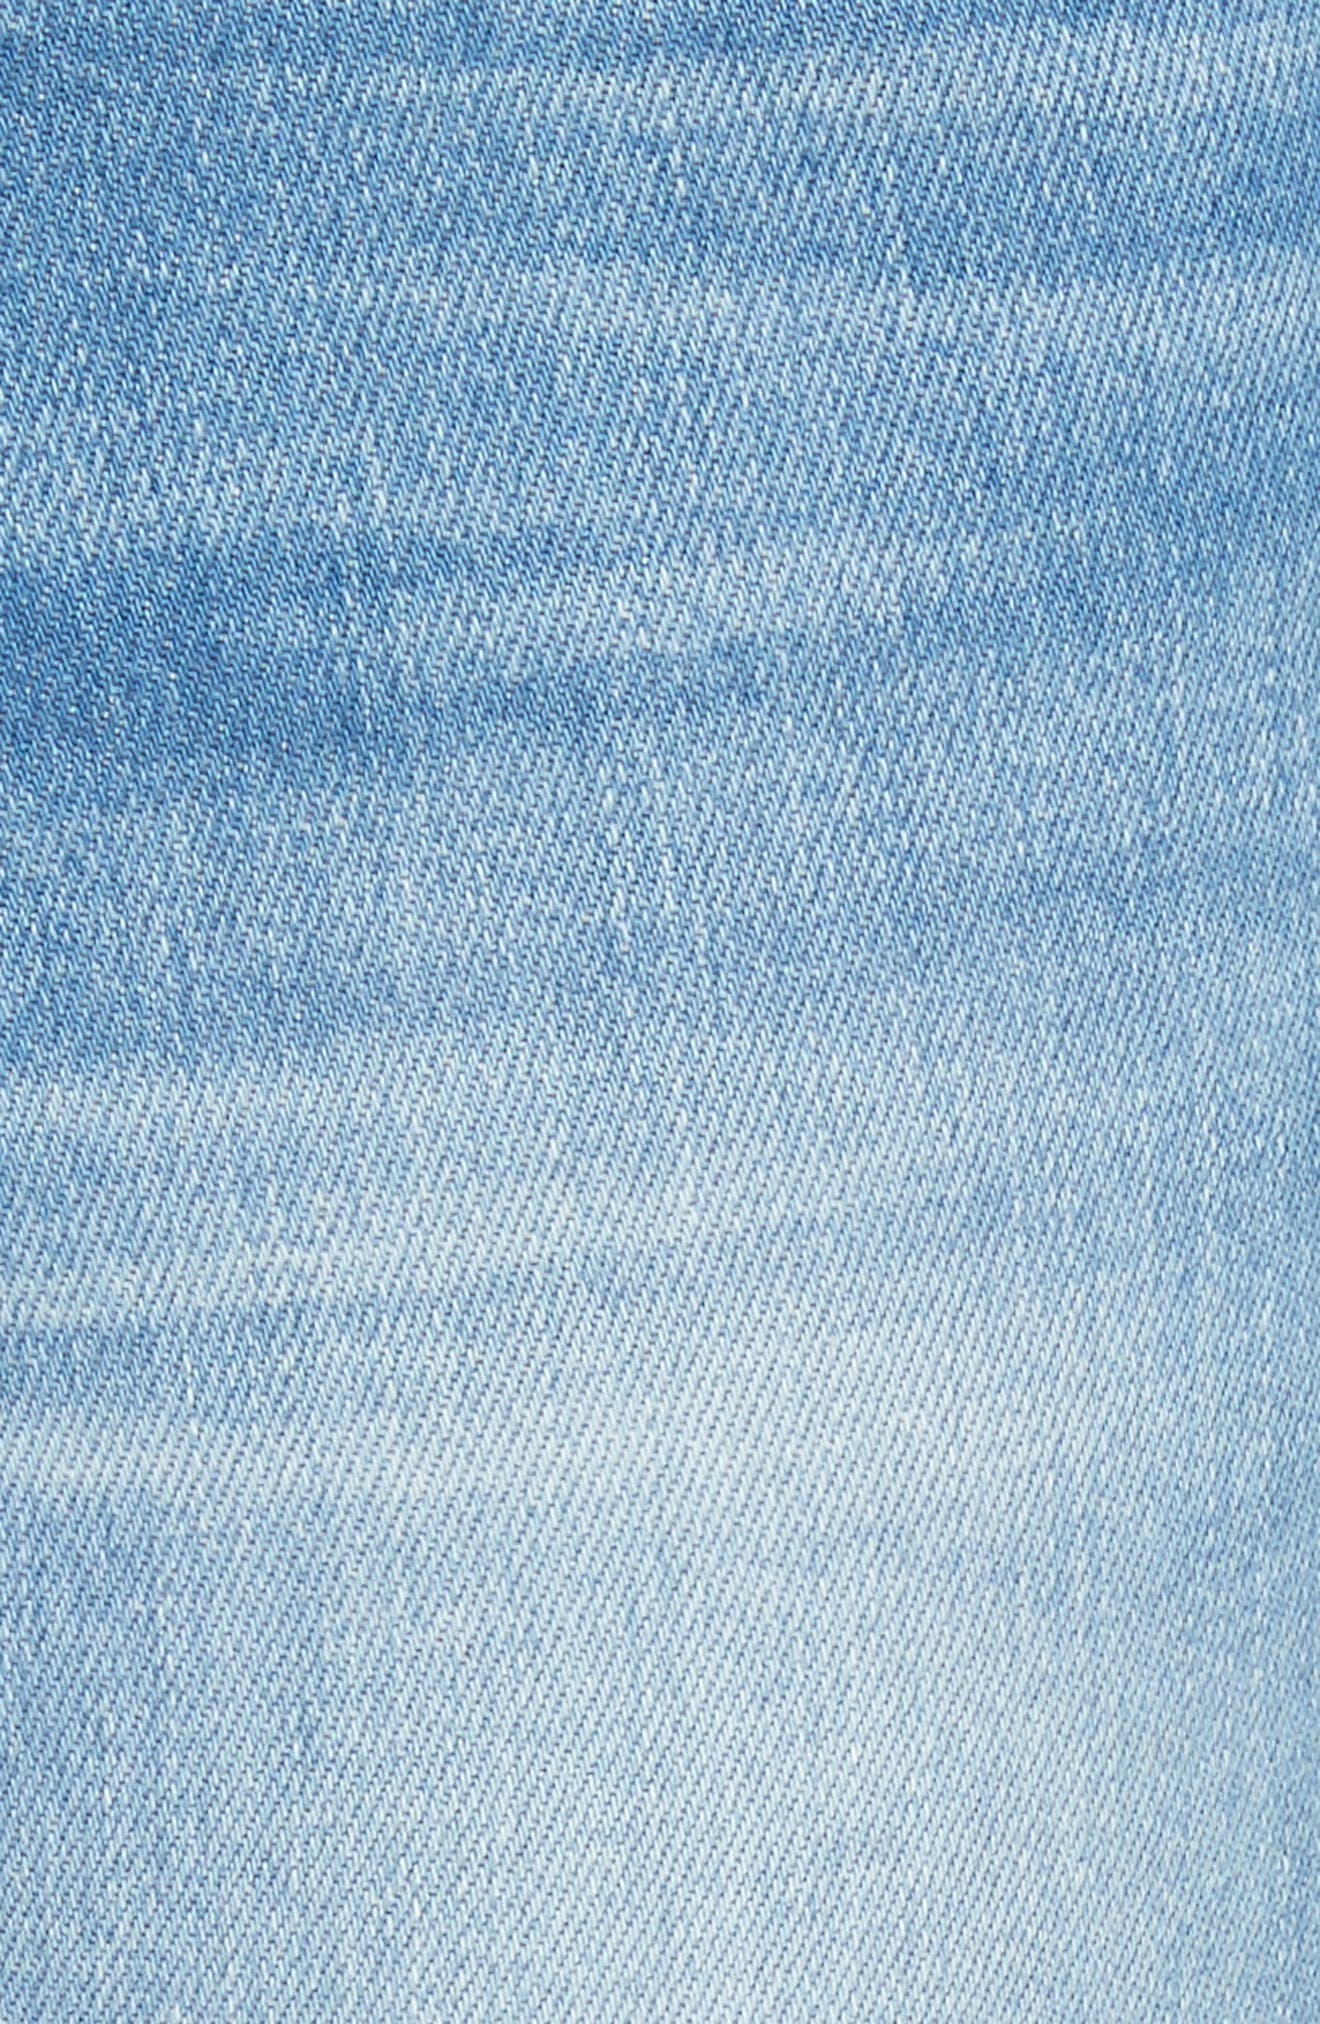 Ali High Waist Ankle Skinny Jeans,                             Alternate thumbnail 5, color,                             Opus